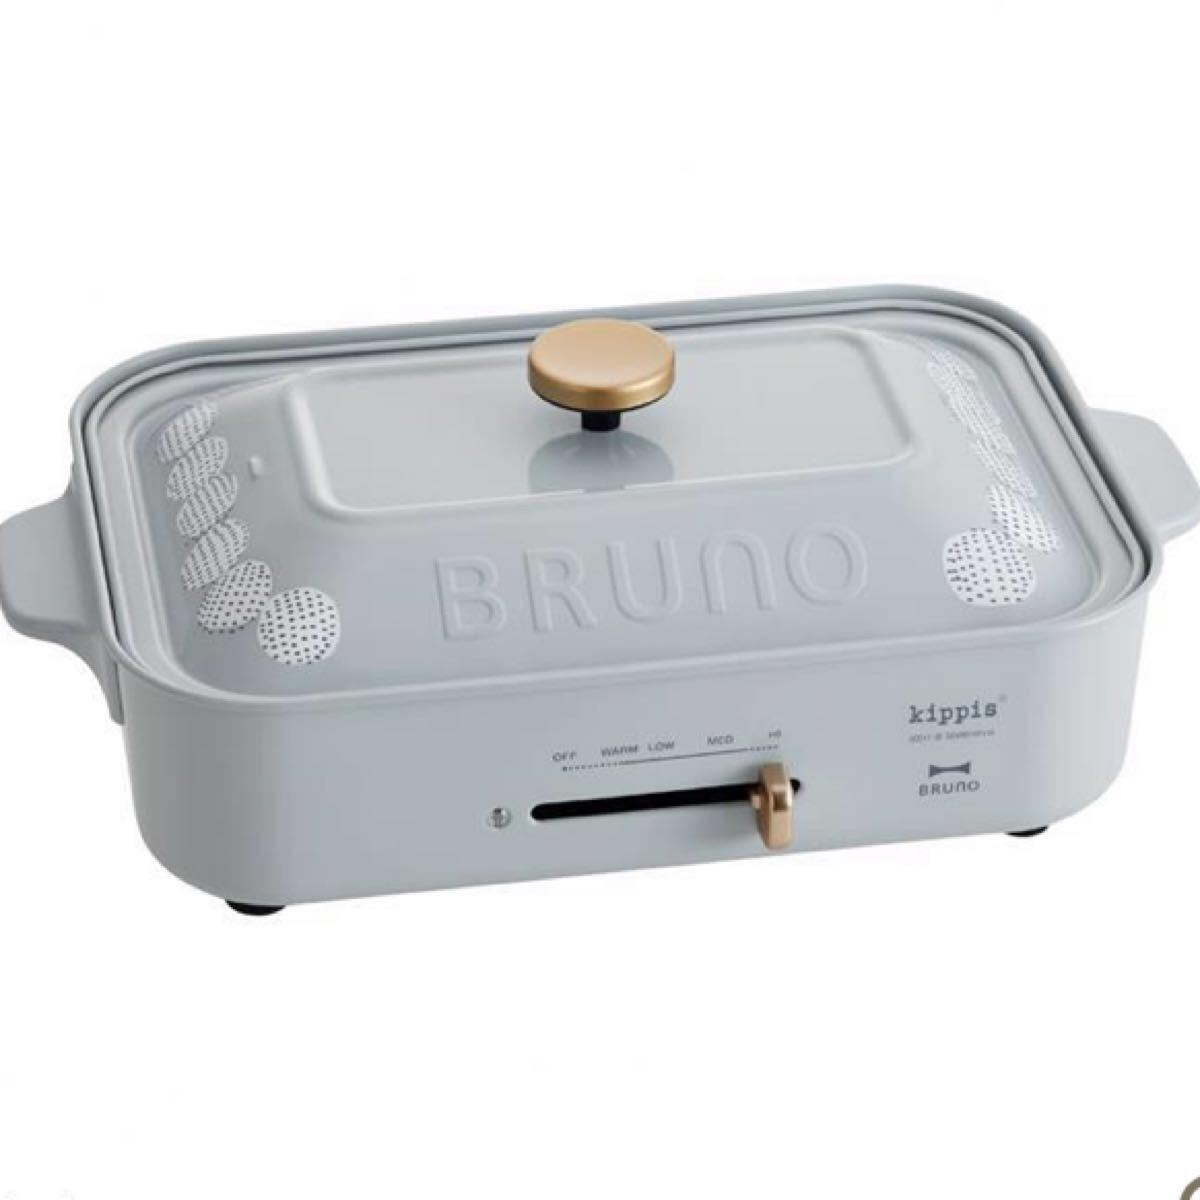 BRUNO/kippisコンパクトホットプレート ティッパドット